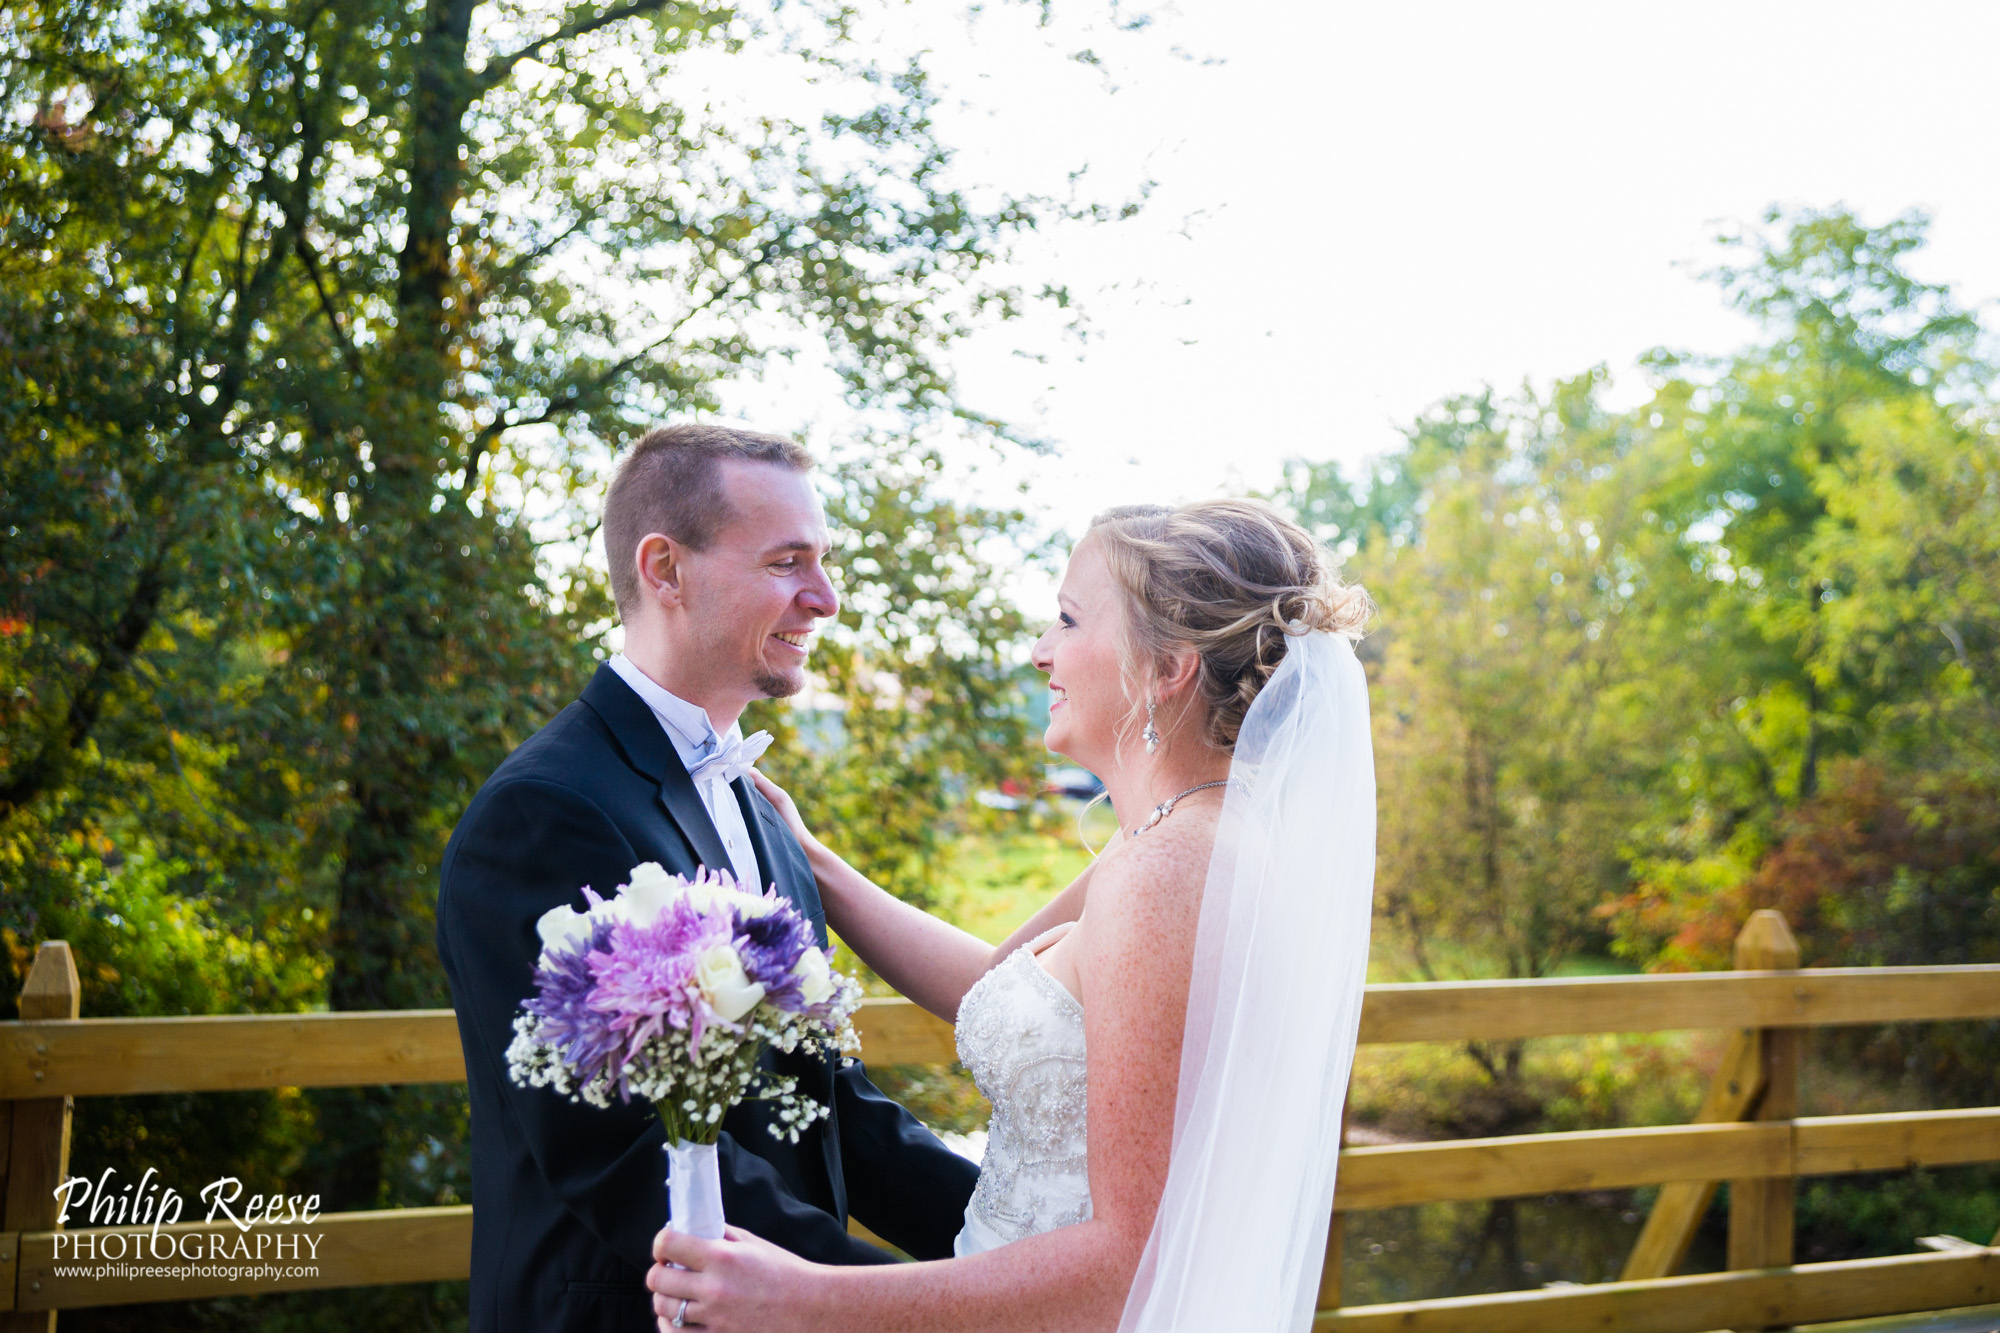 Bruder Wedding 010 - 05498.jpg